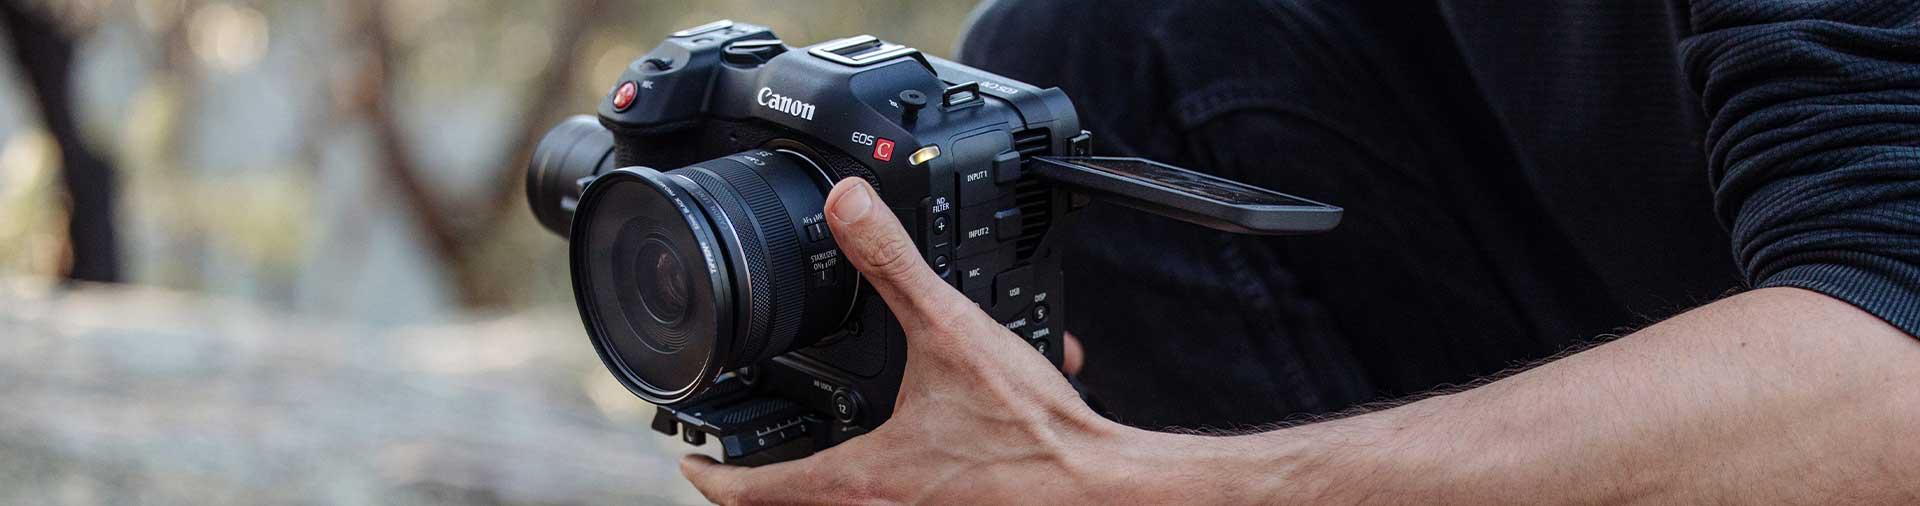 canon-eos-c70-cinema-body-in-hands-against-bush-backdrop